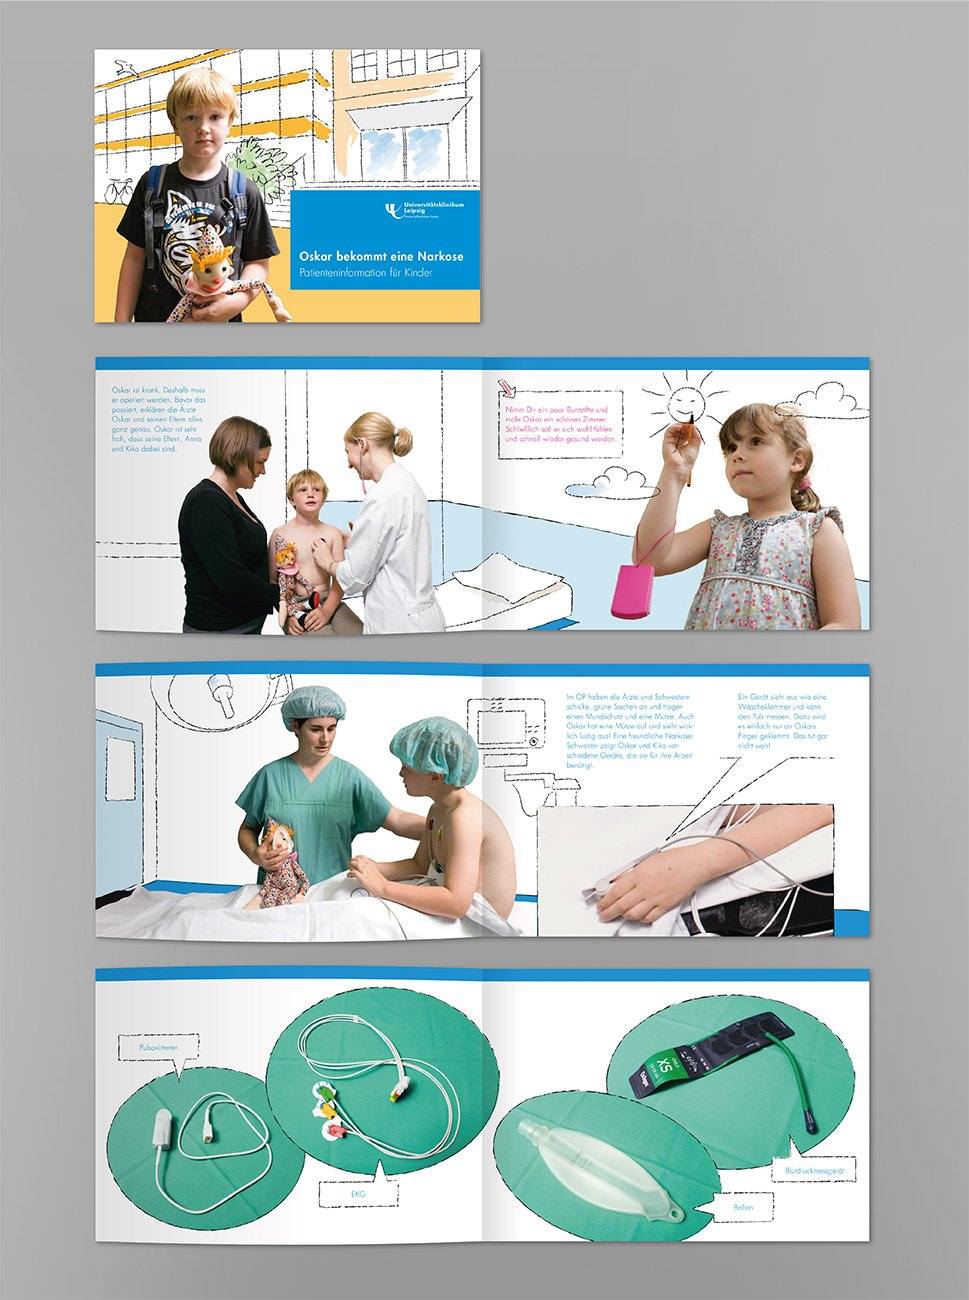 20 UKL Broschur narkoseleitfaden illustration 1